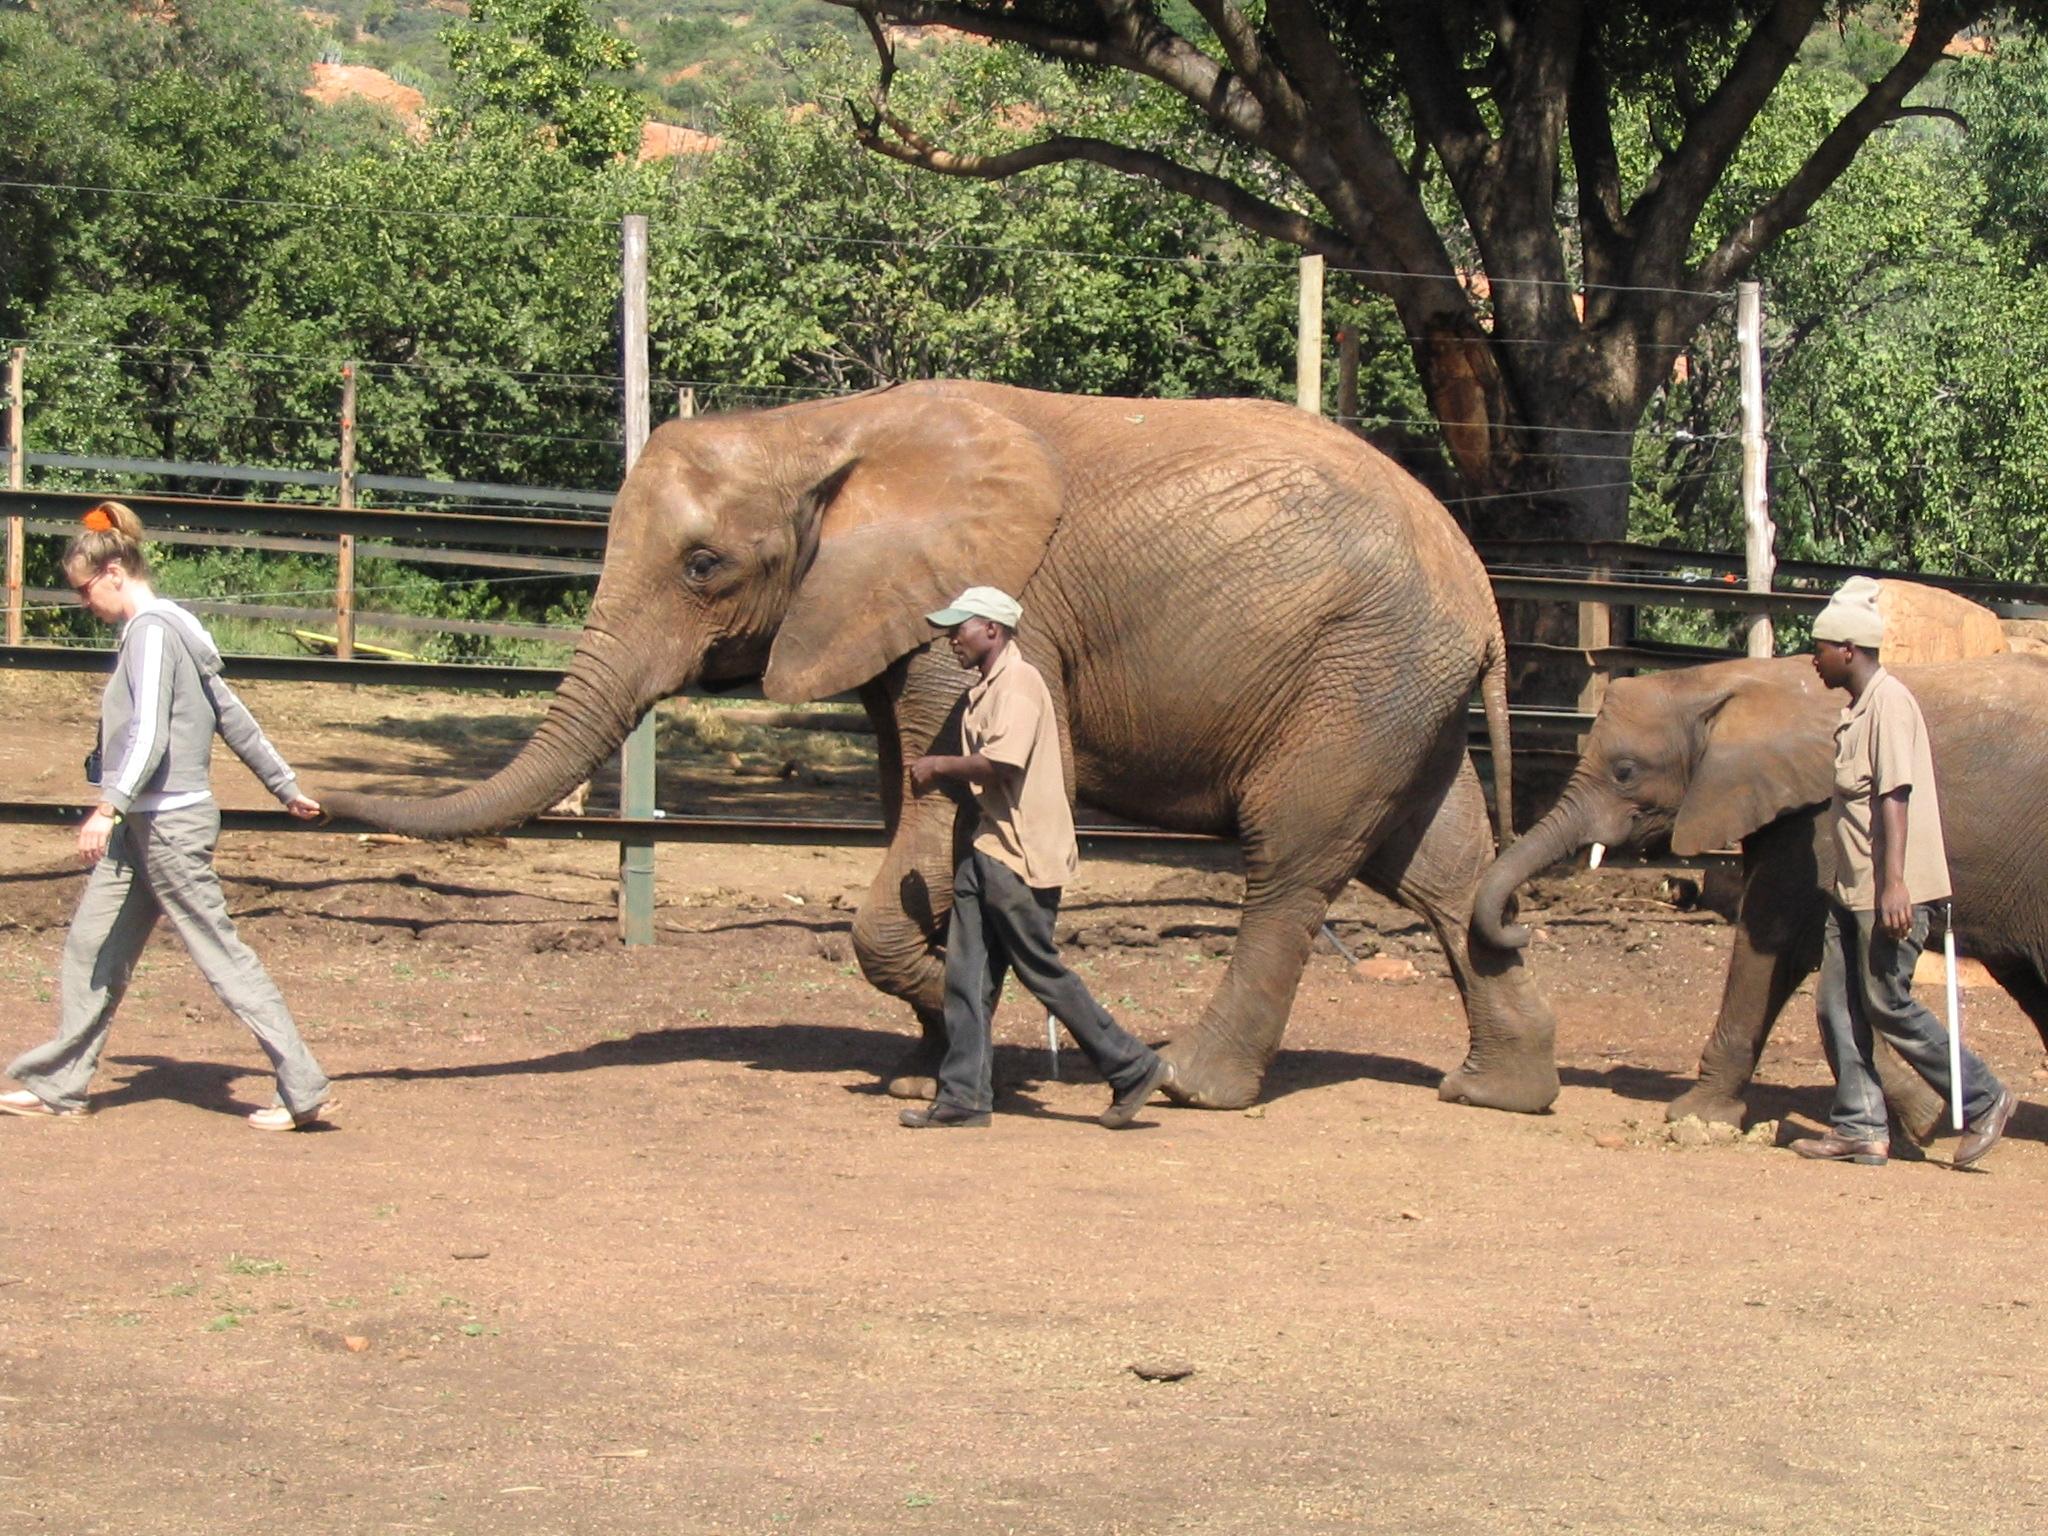 Südafrika: Tagestour zum Elefantenschutzzentrum bei Pretoria